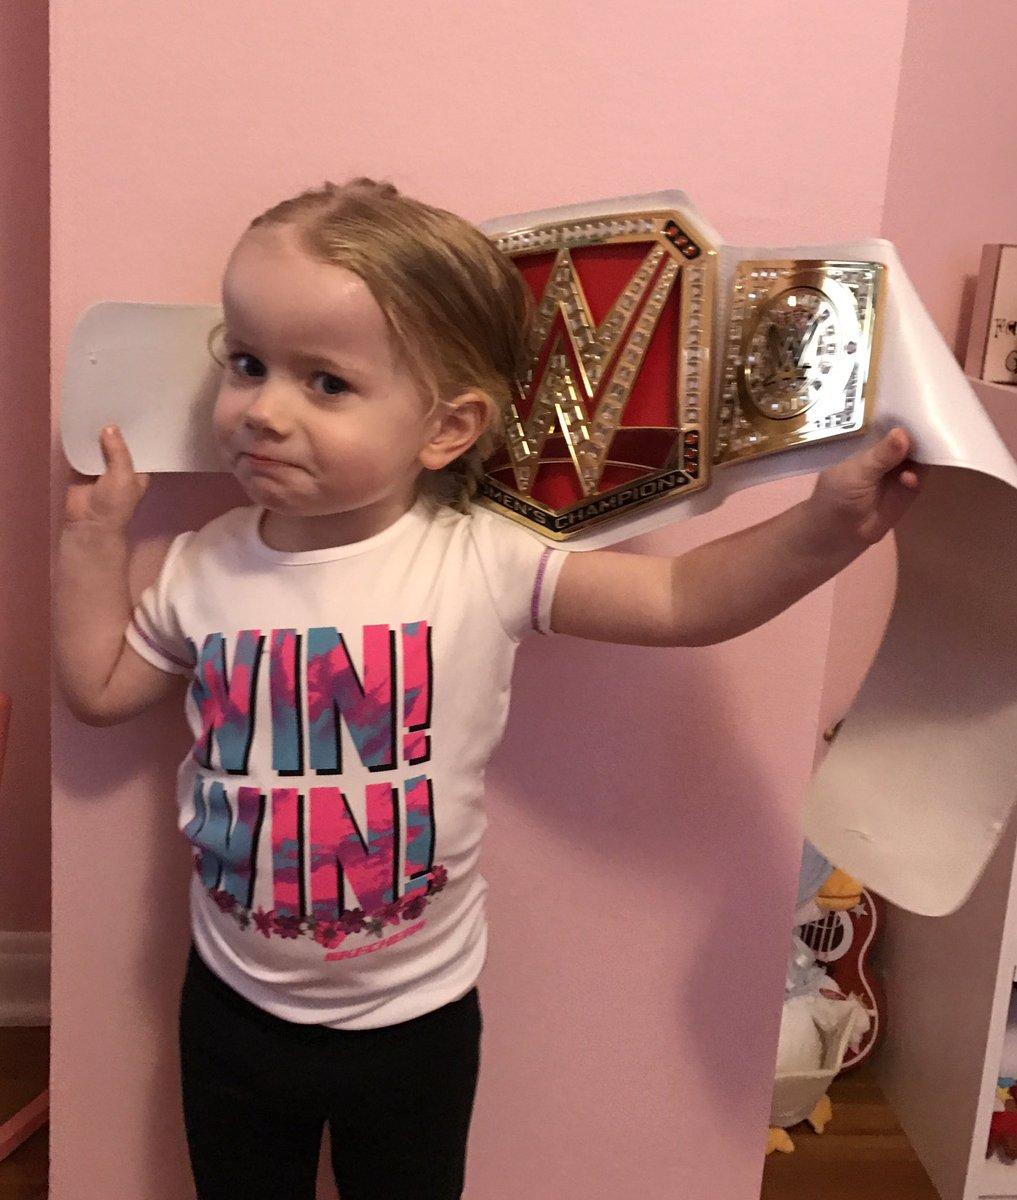 It&#39;s Little Miss Maisy! She&#39;s even got the attitude down! @AlexaBliss_WWE @WWEUniverse @StephMcMahon #WWE #LittleMissBliss #RAW <br>http://pic.twitter.com/D4DLQWb61m